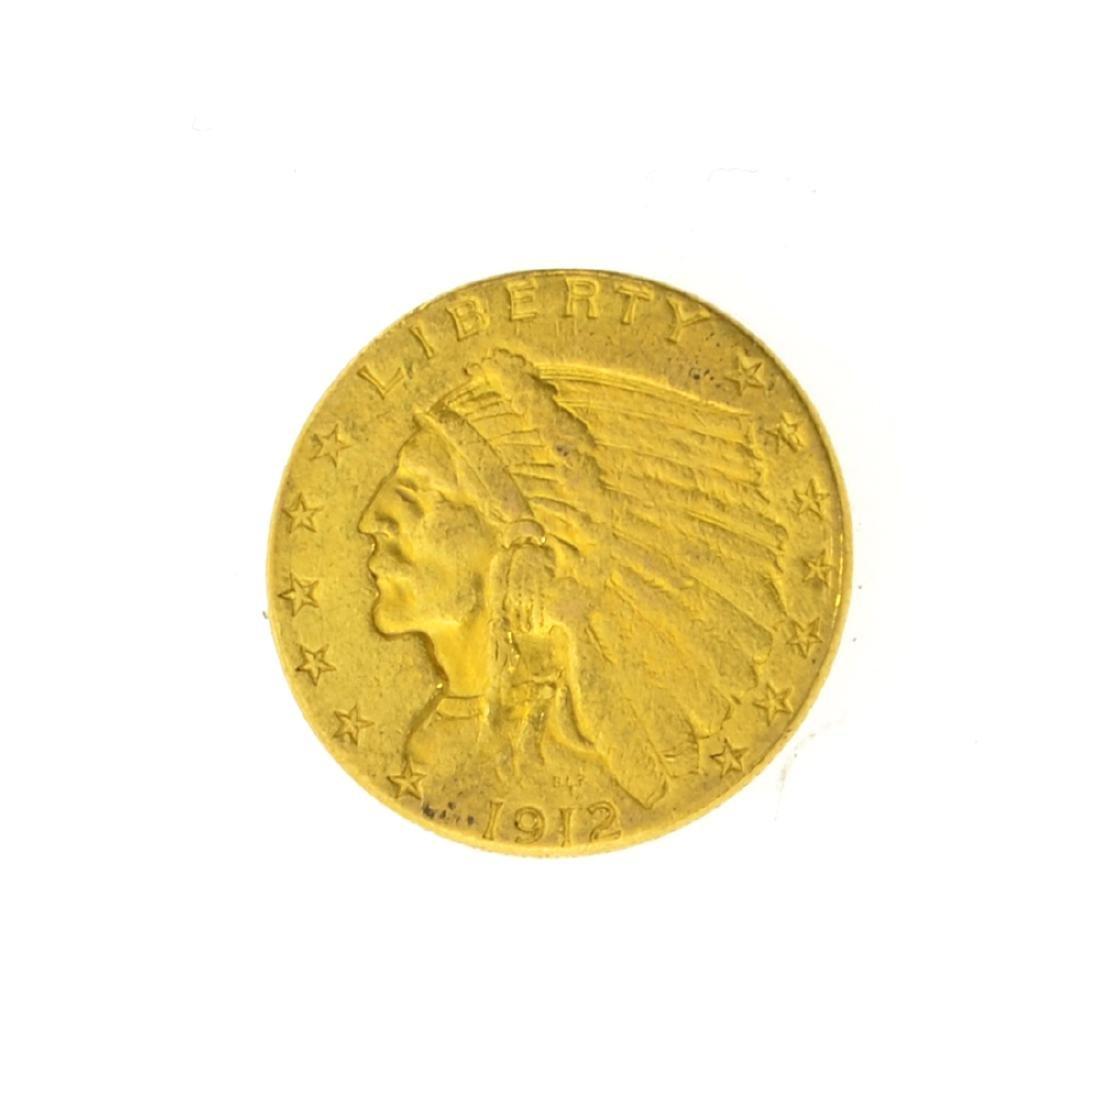 *1912 $2.50 U.S. Indian Head Gold Coin (JG)